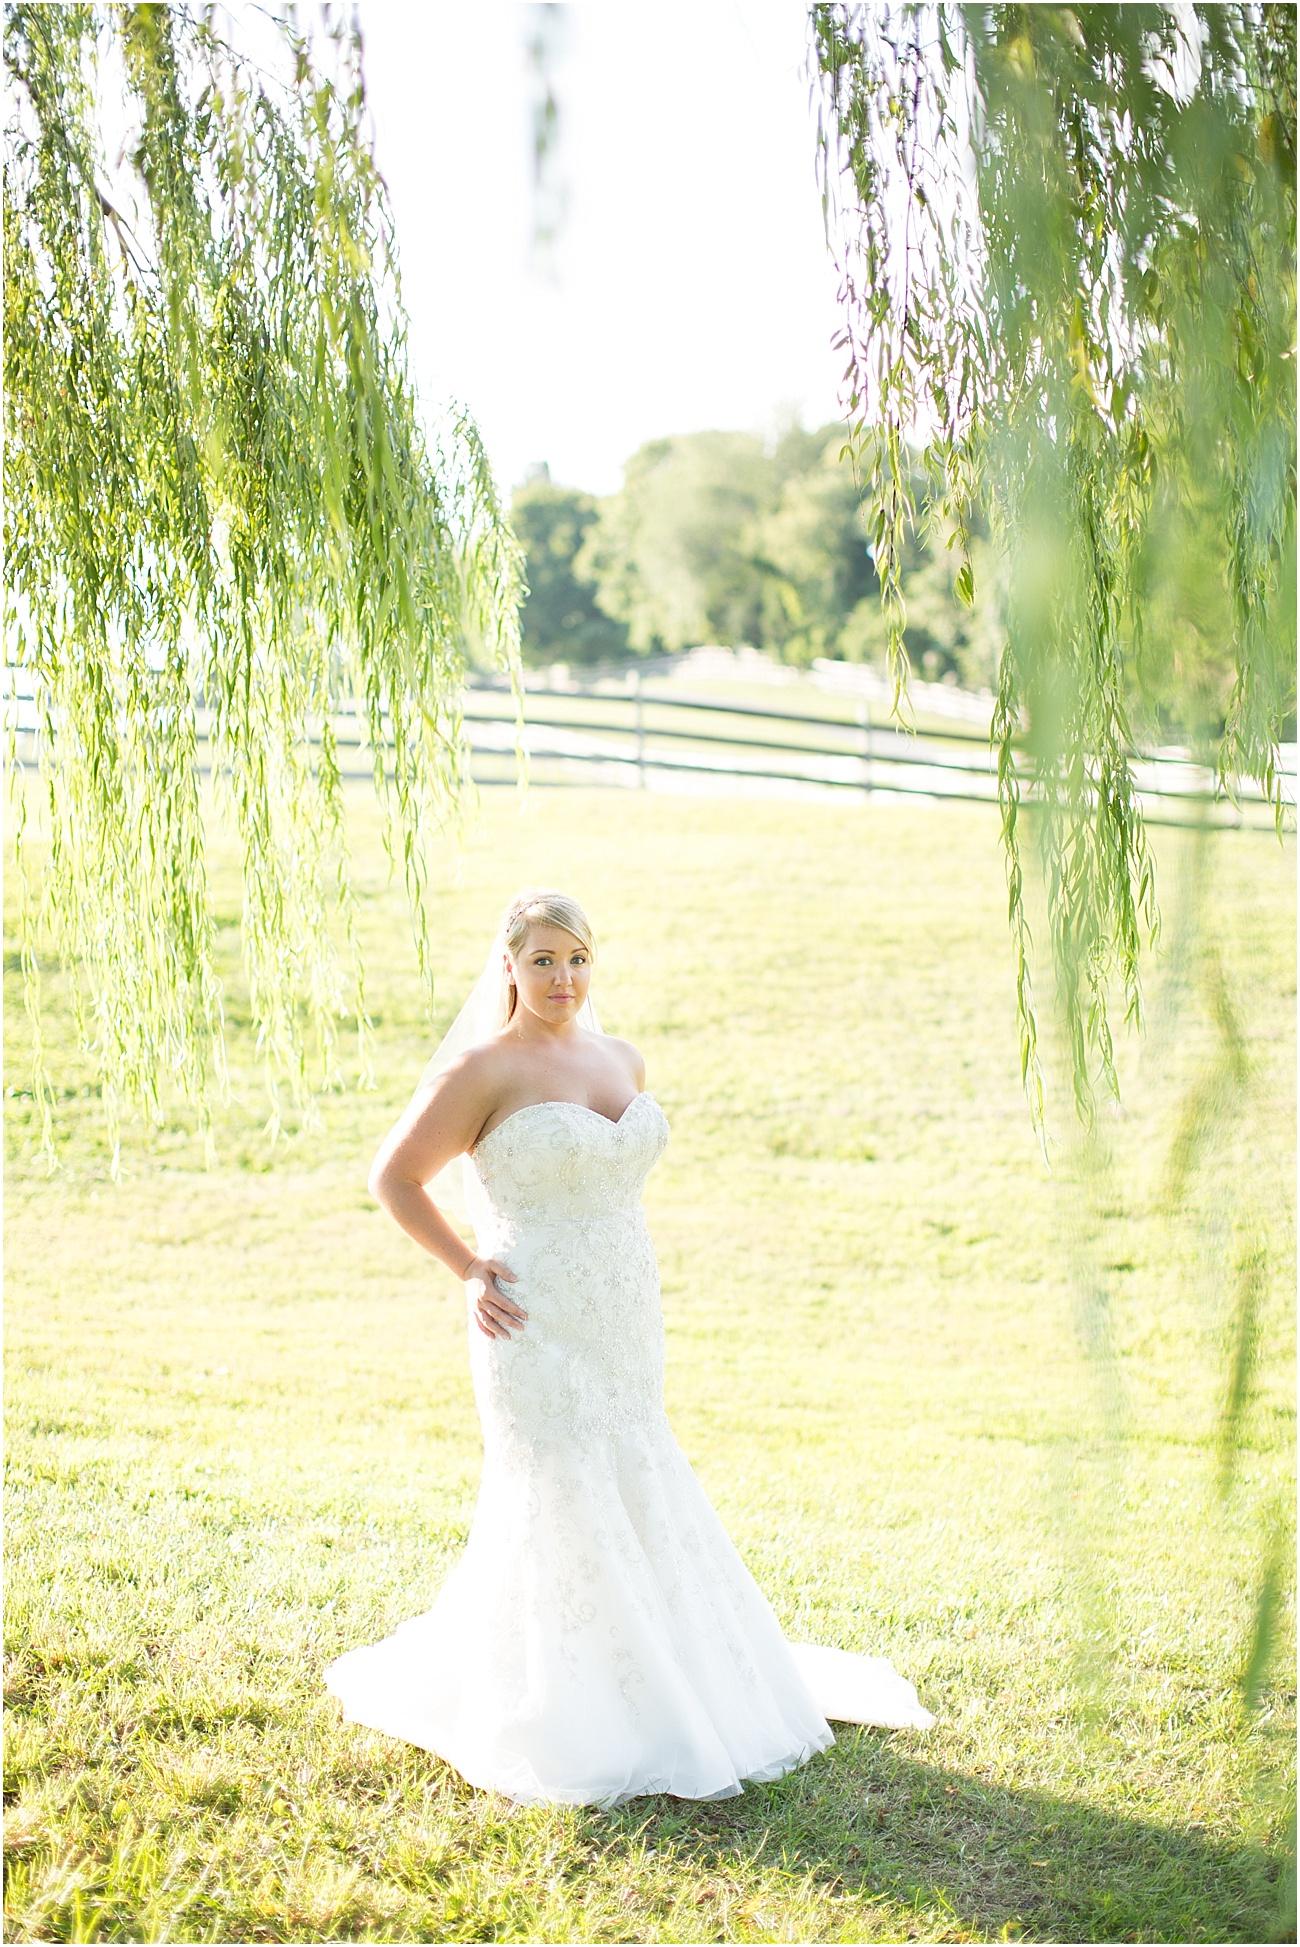 Lacey_Bridal_Portraits_Elk_Manor_Winery_Maryland_Wedding_Photographer_0015